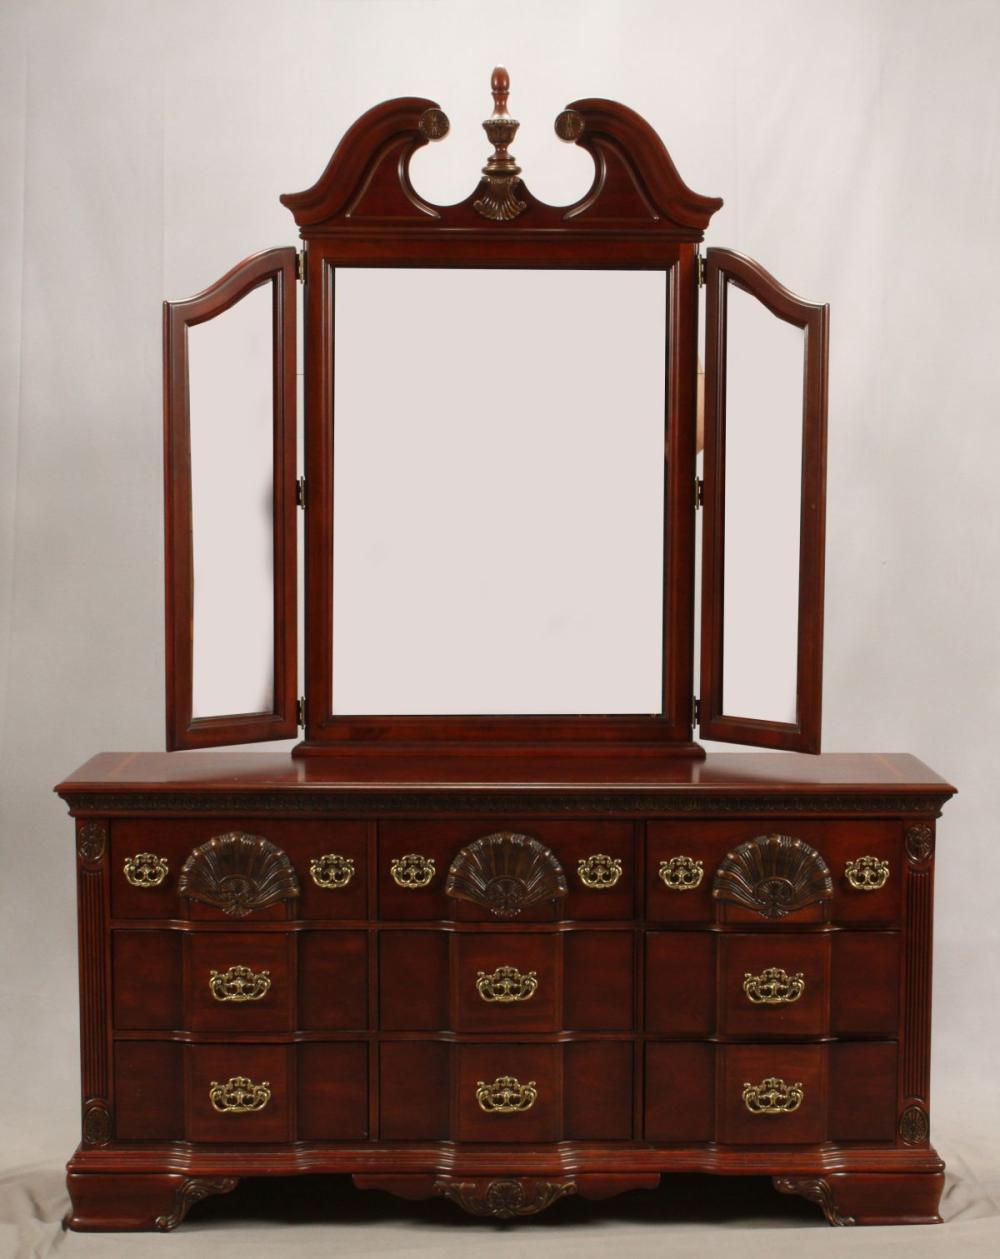 Sold Price Kathy Ireland Mahogany Carved Bedroom Set Invalid Date Est